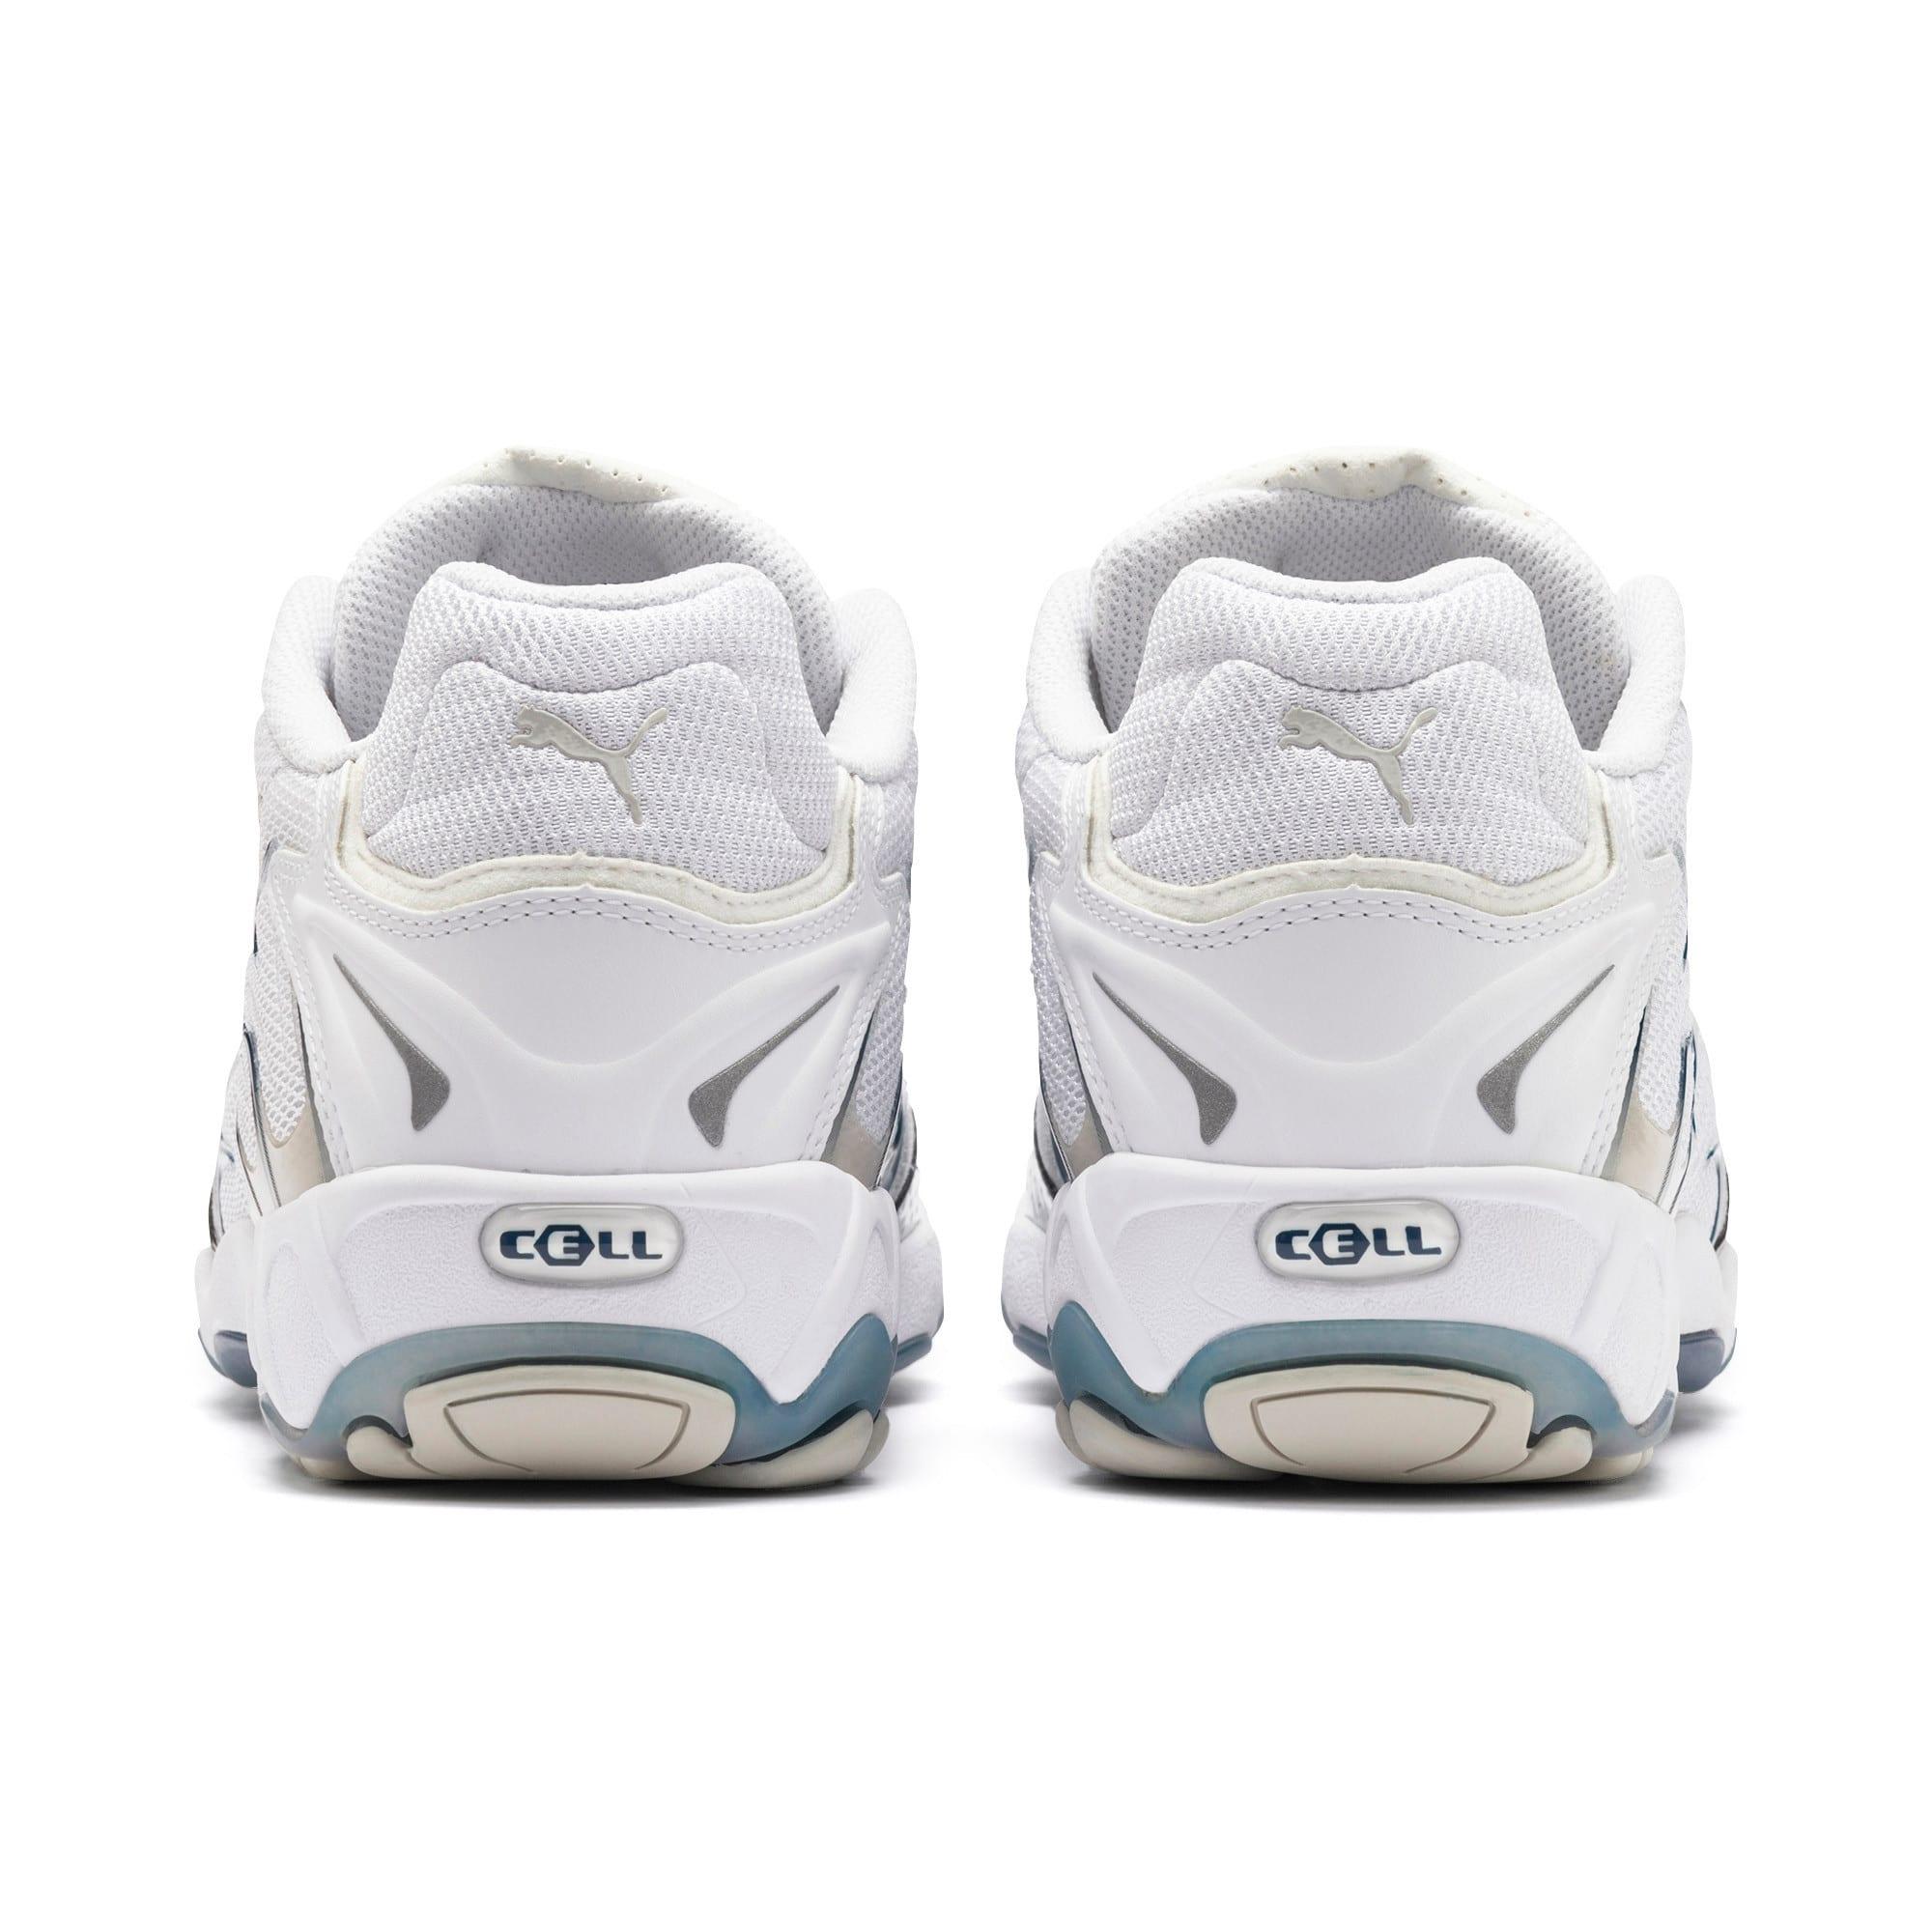 Thumbnail 4 of Inhale Sneakers, Puma White-Gray Violet, medium